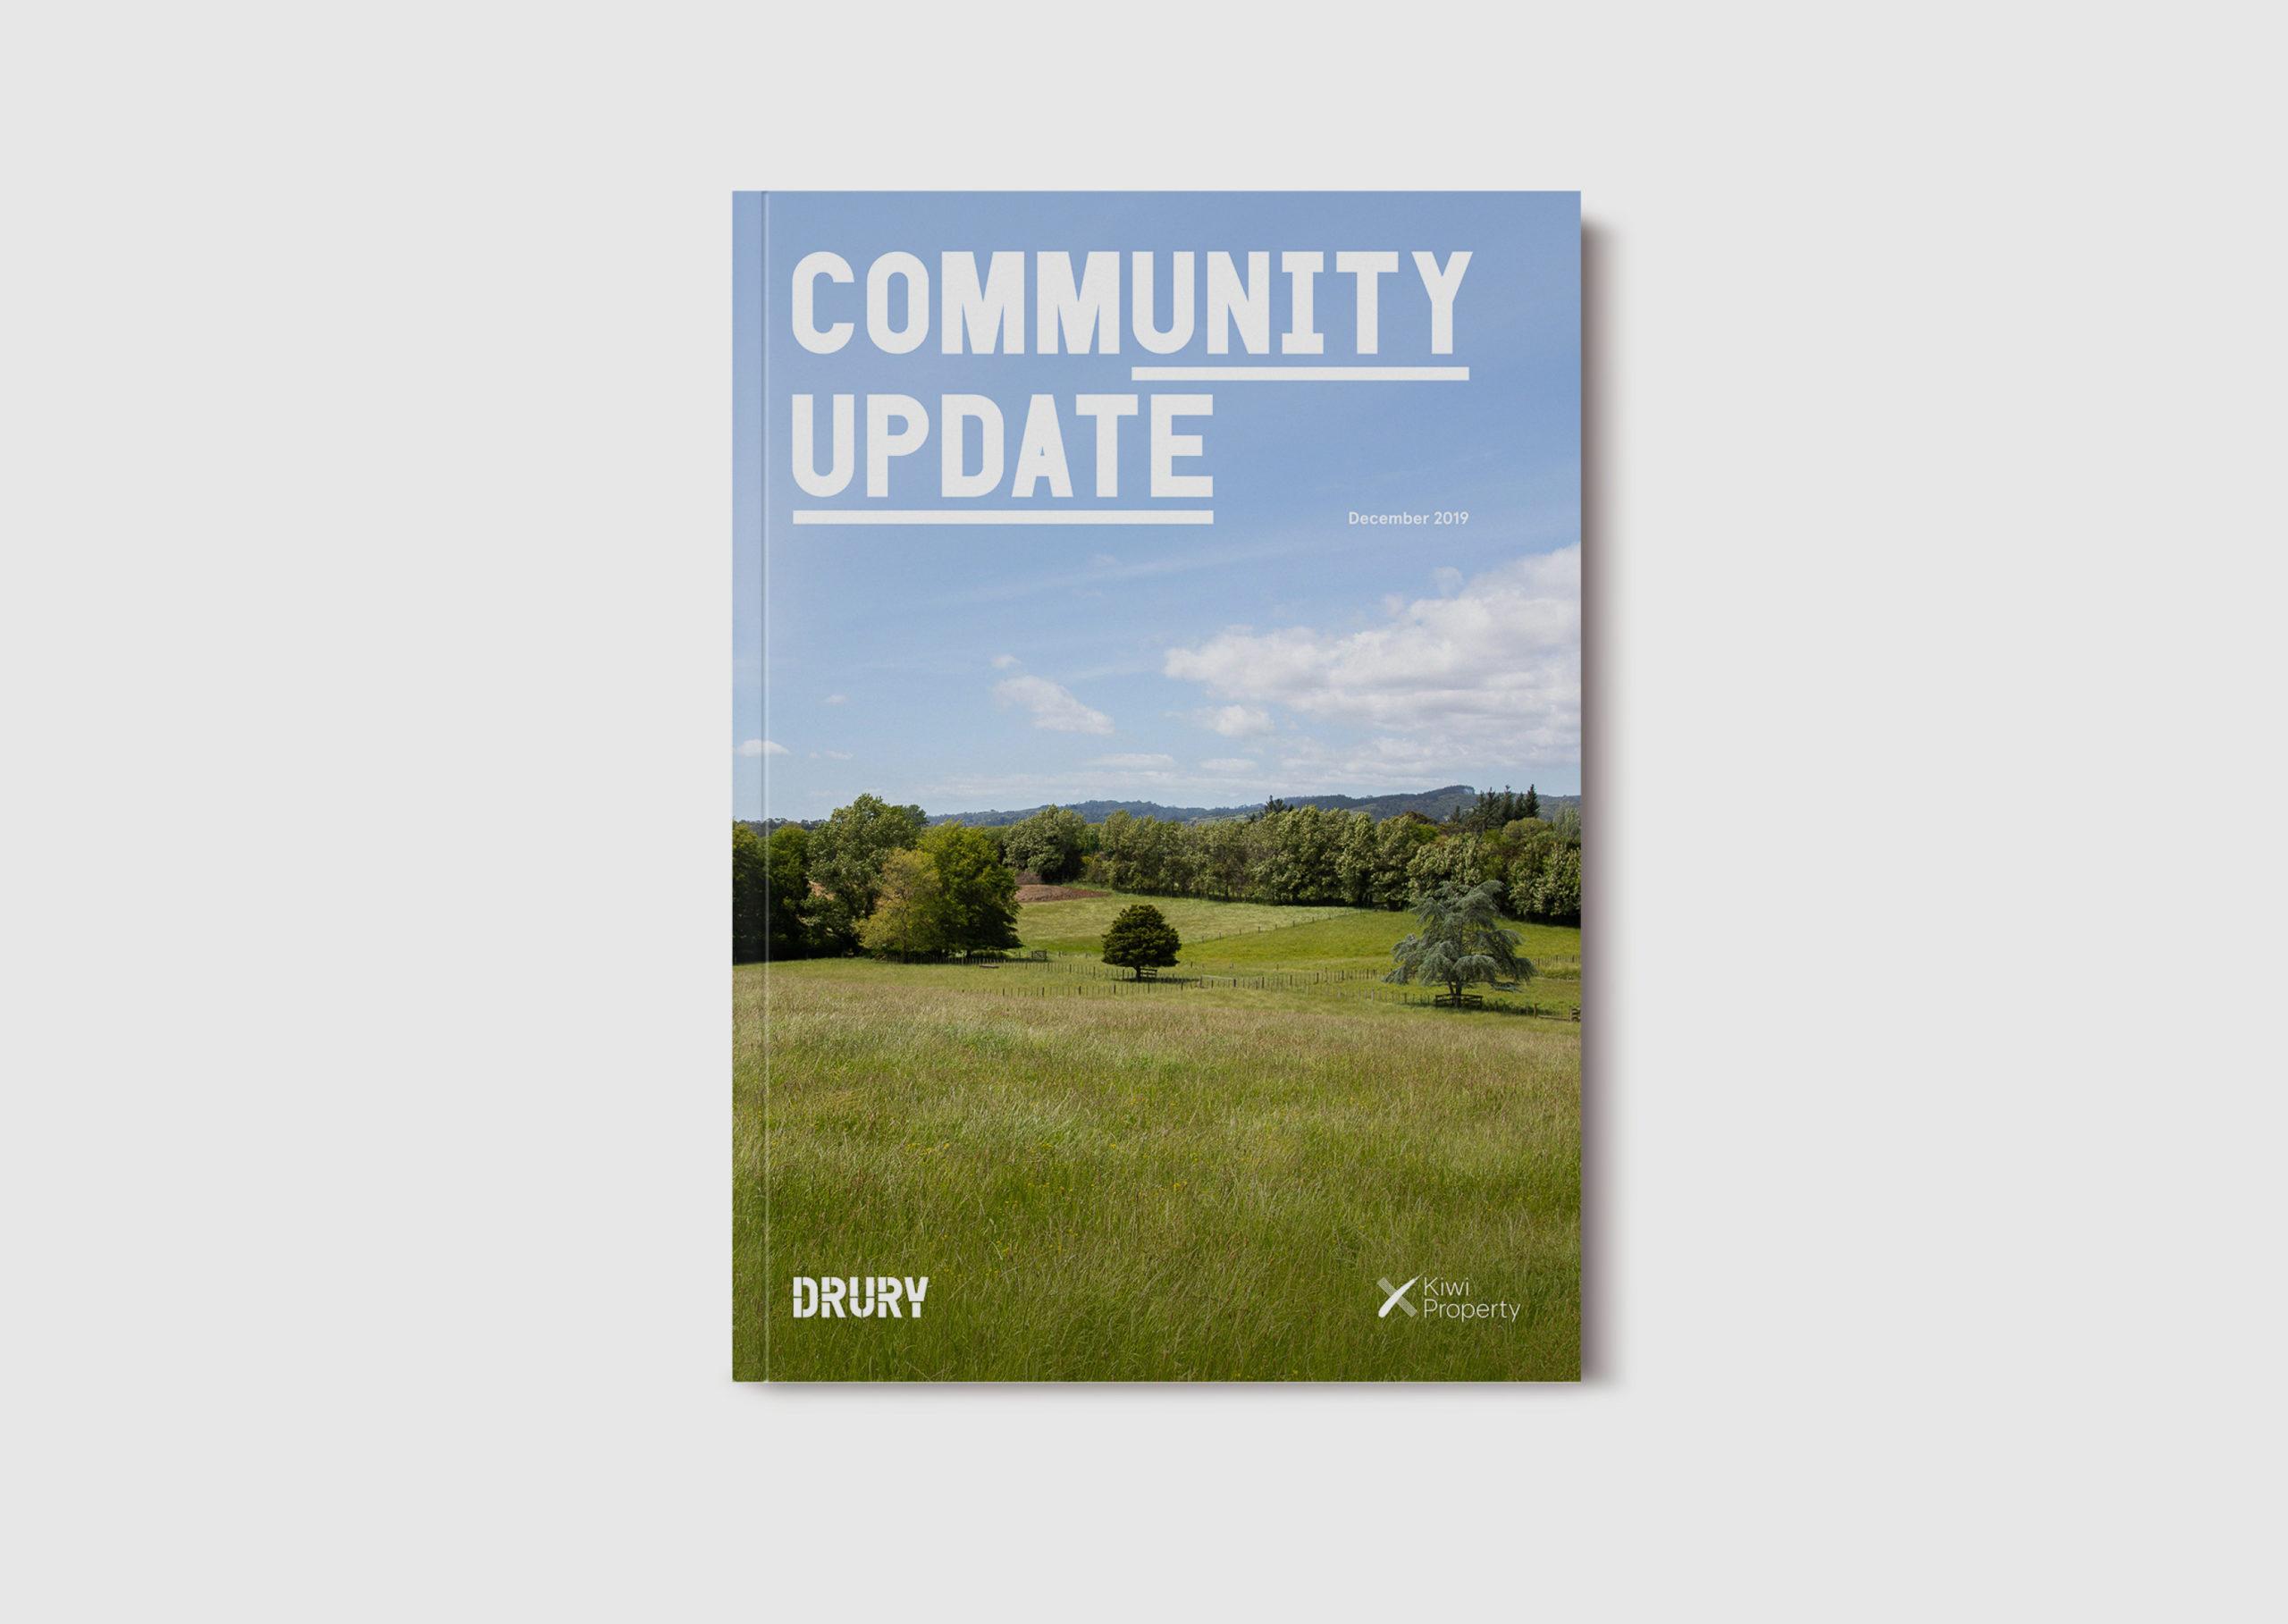 Drury development communications Community Update Brochure cover showing idyllic pasture